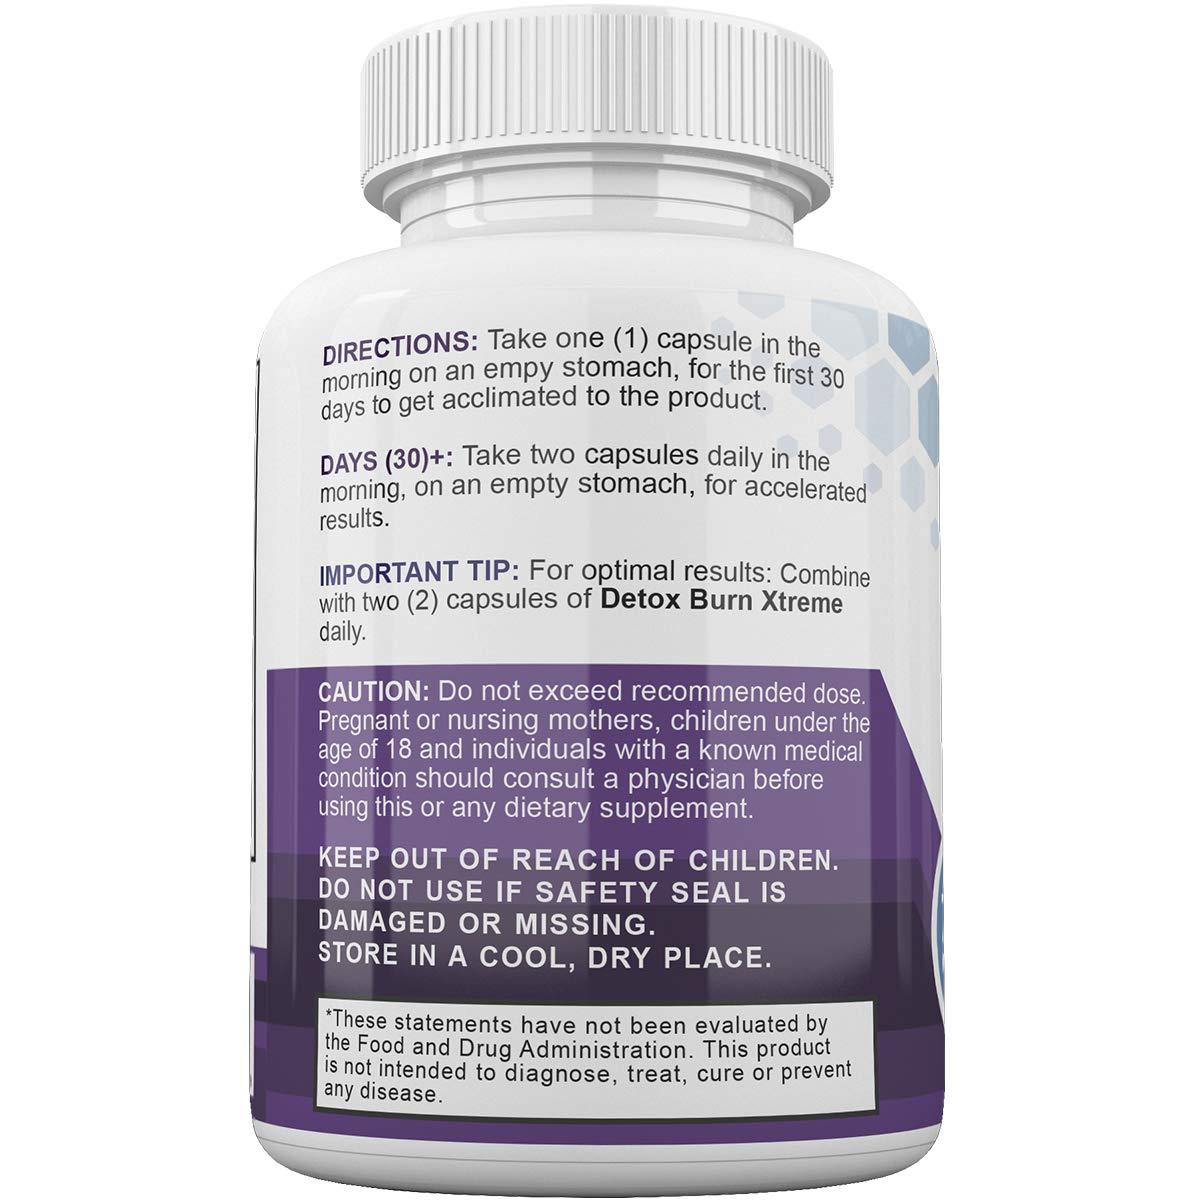 Keto Burn Xtreme - BHB Ketones - Suppress Appetite - Boost Weight Loss - Burn Fat As Fuel - 700mg Keto Blend - 30 Day Supply by Keto Burn Xtreme (Image #2)